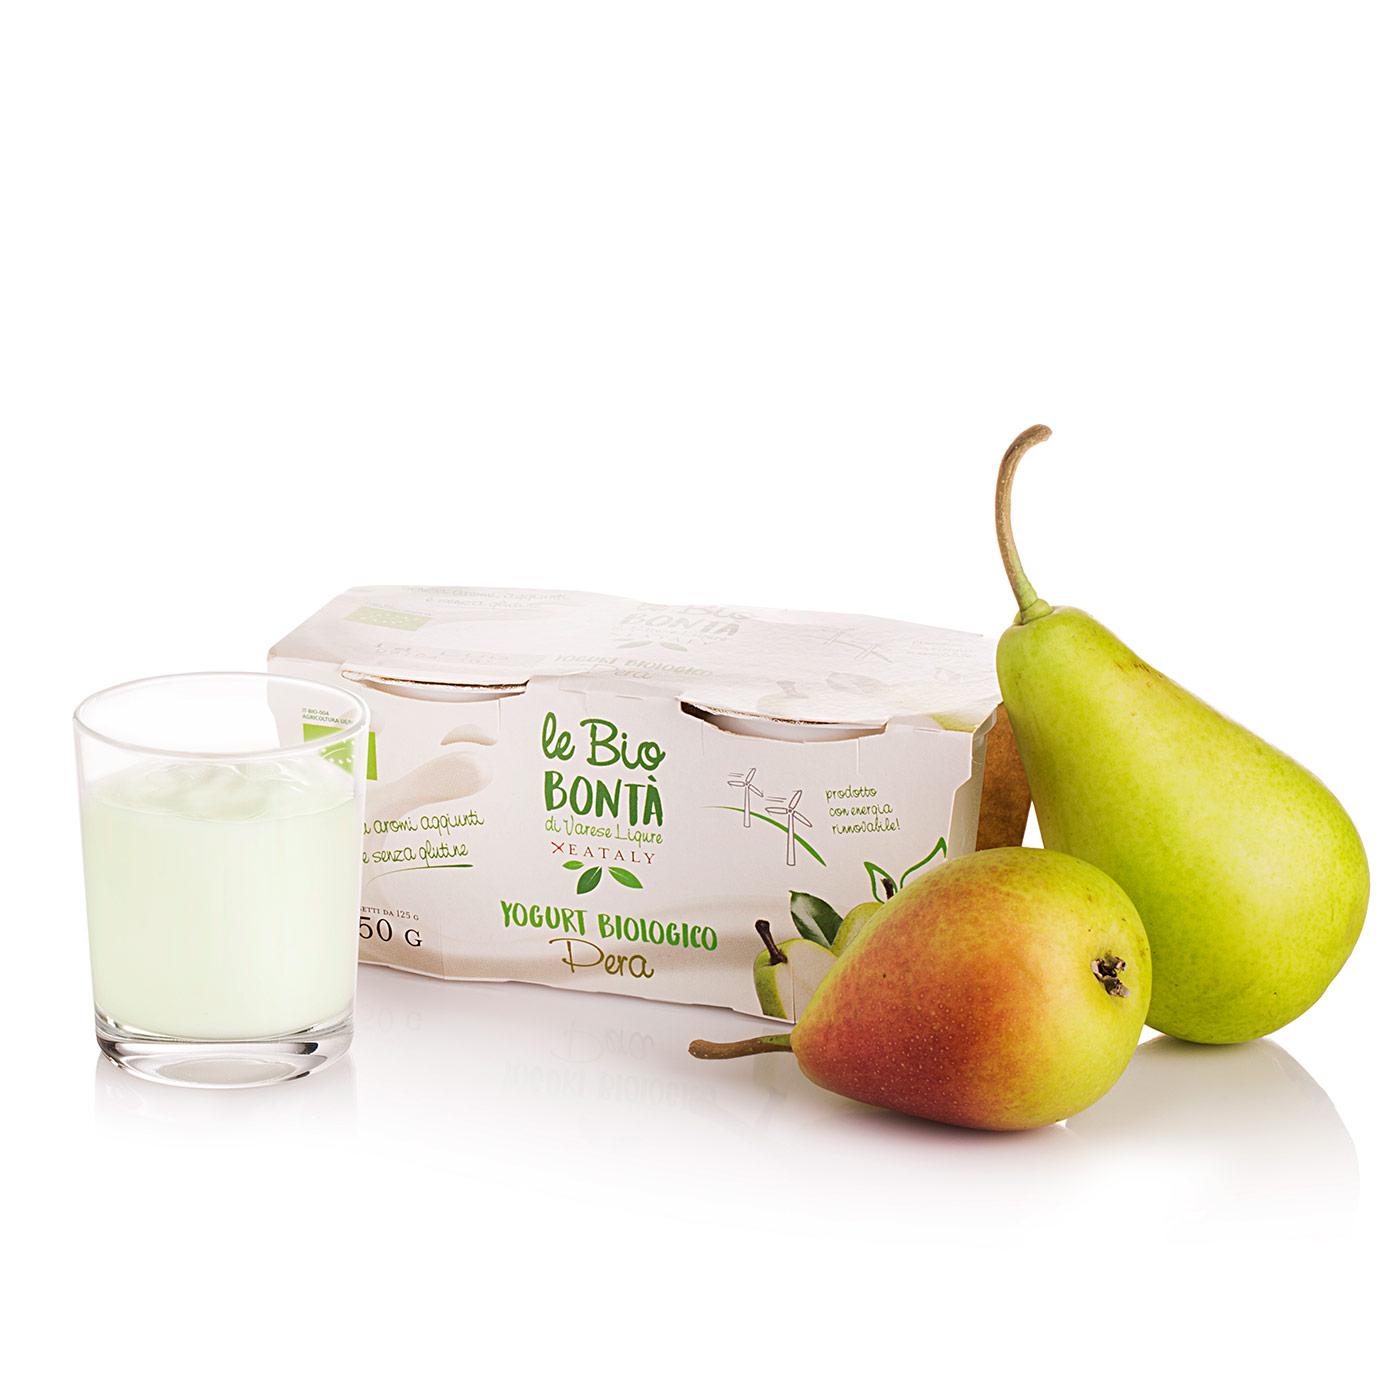 Bio Bontà x Eataly Yogurt Intero alla Pera Bio 2x125g